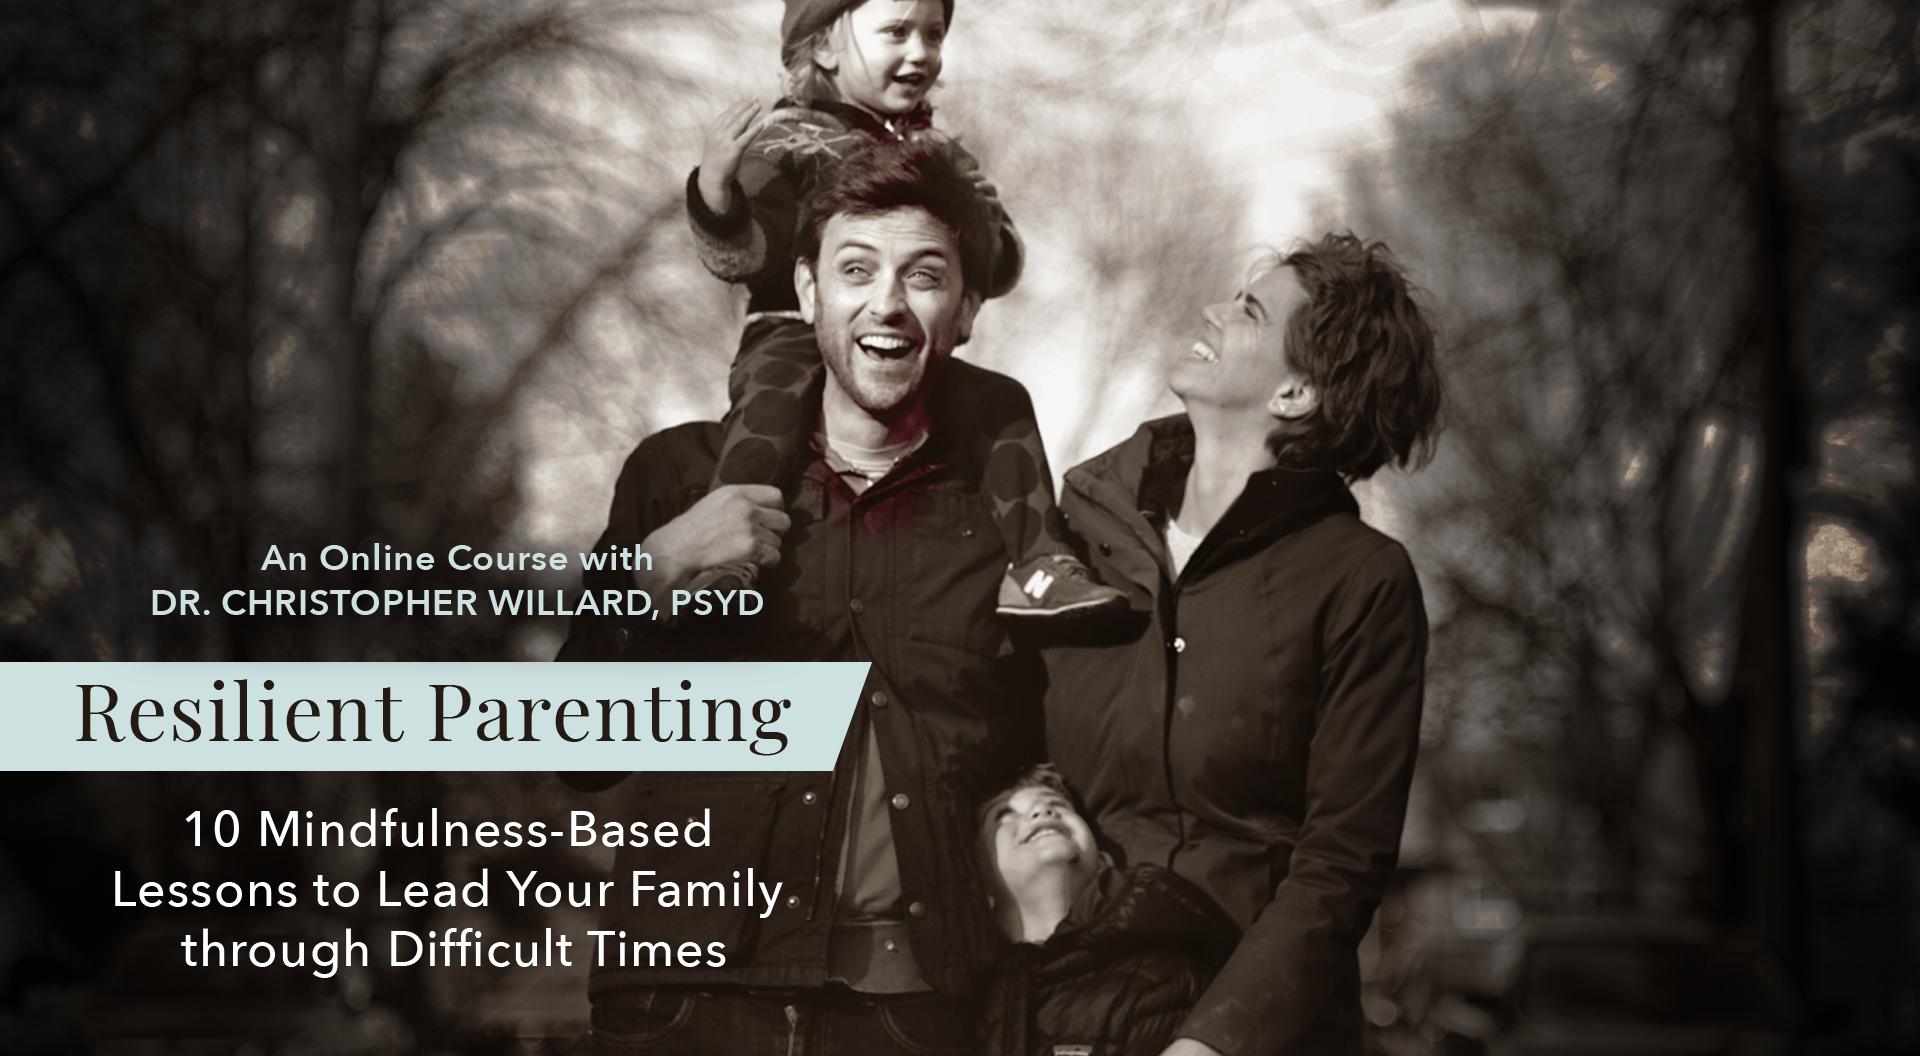 Resilient Parenting